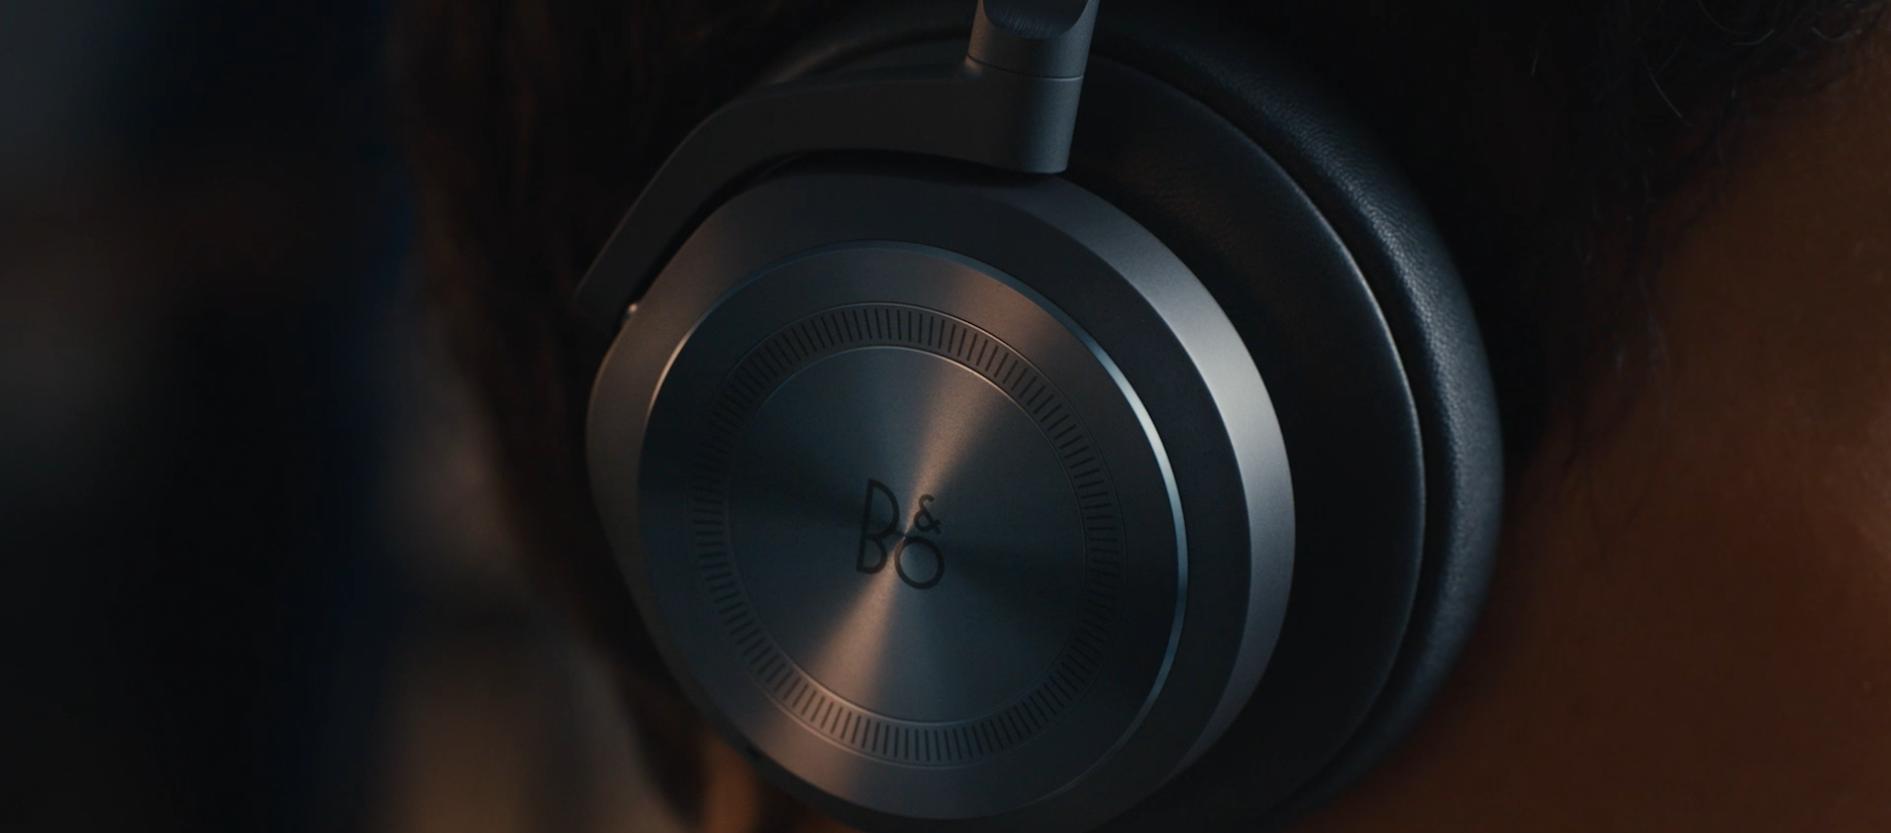 słuchawki Bang & Olufsen Beoplay HX headphones